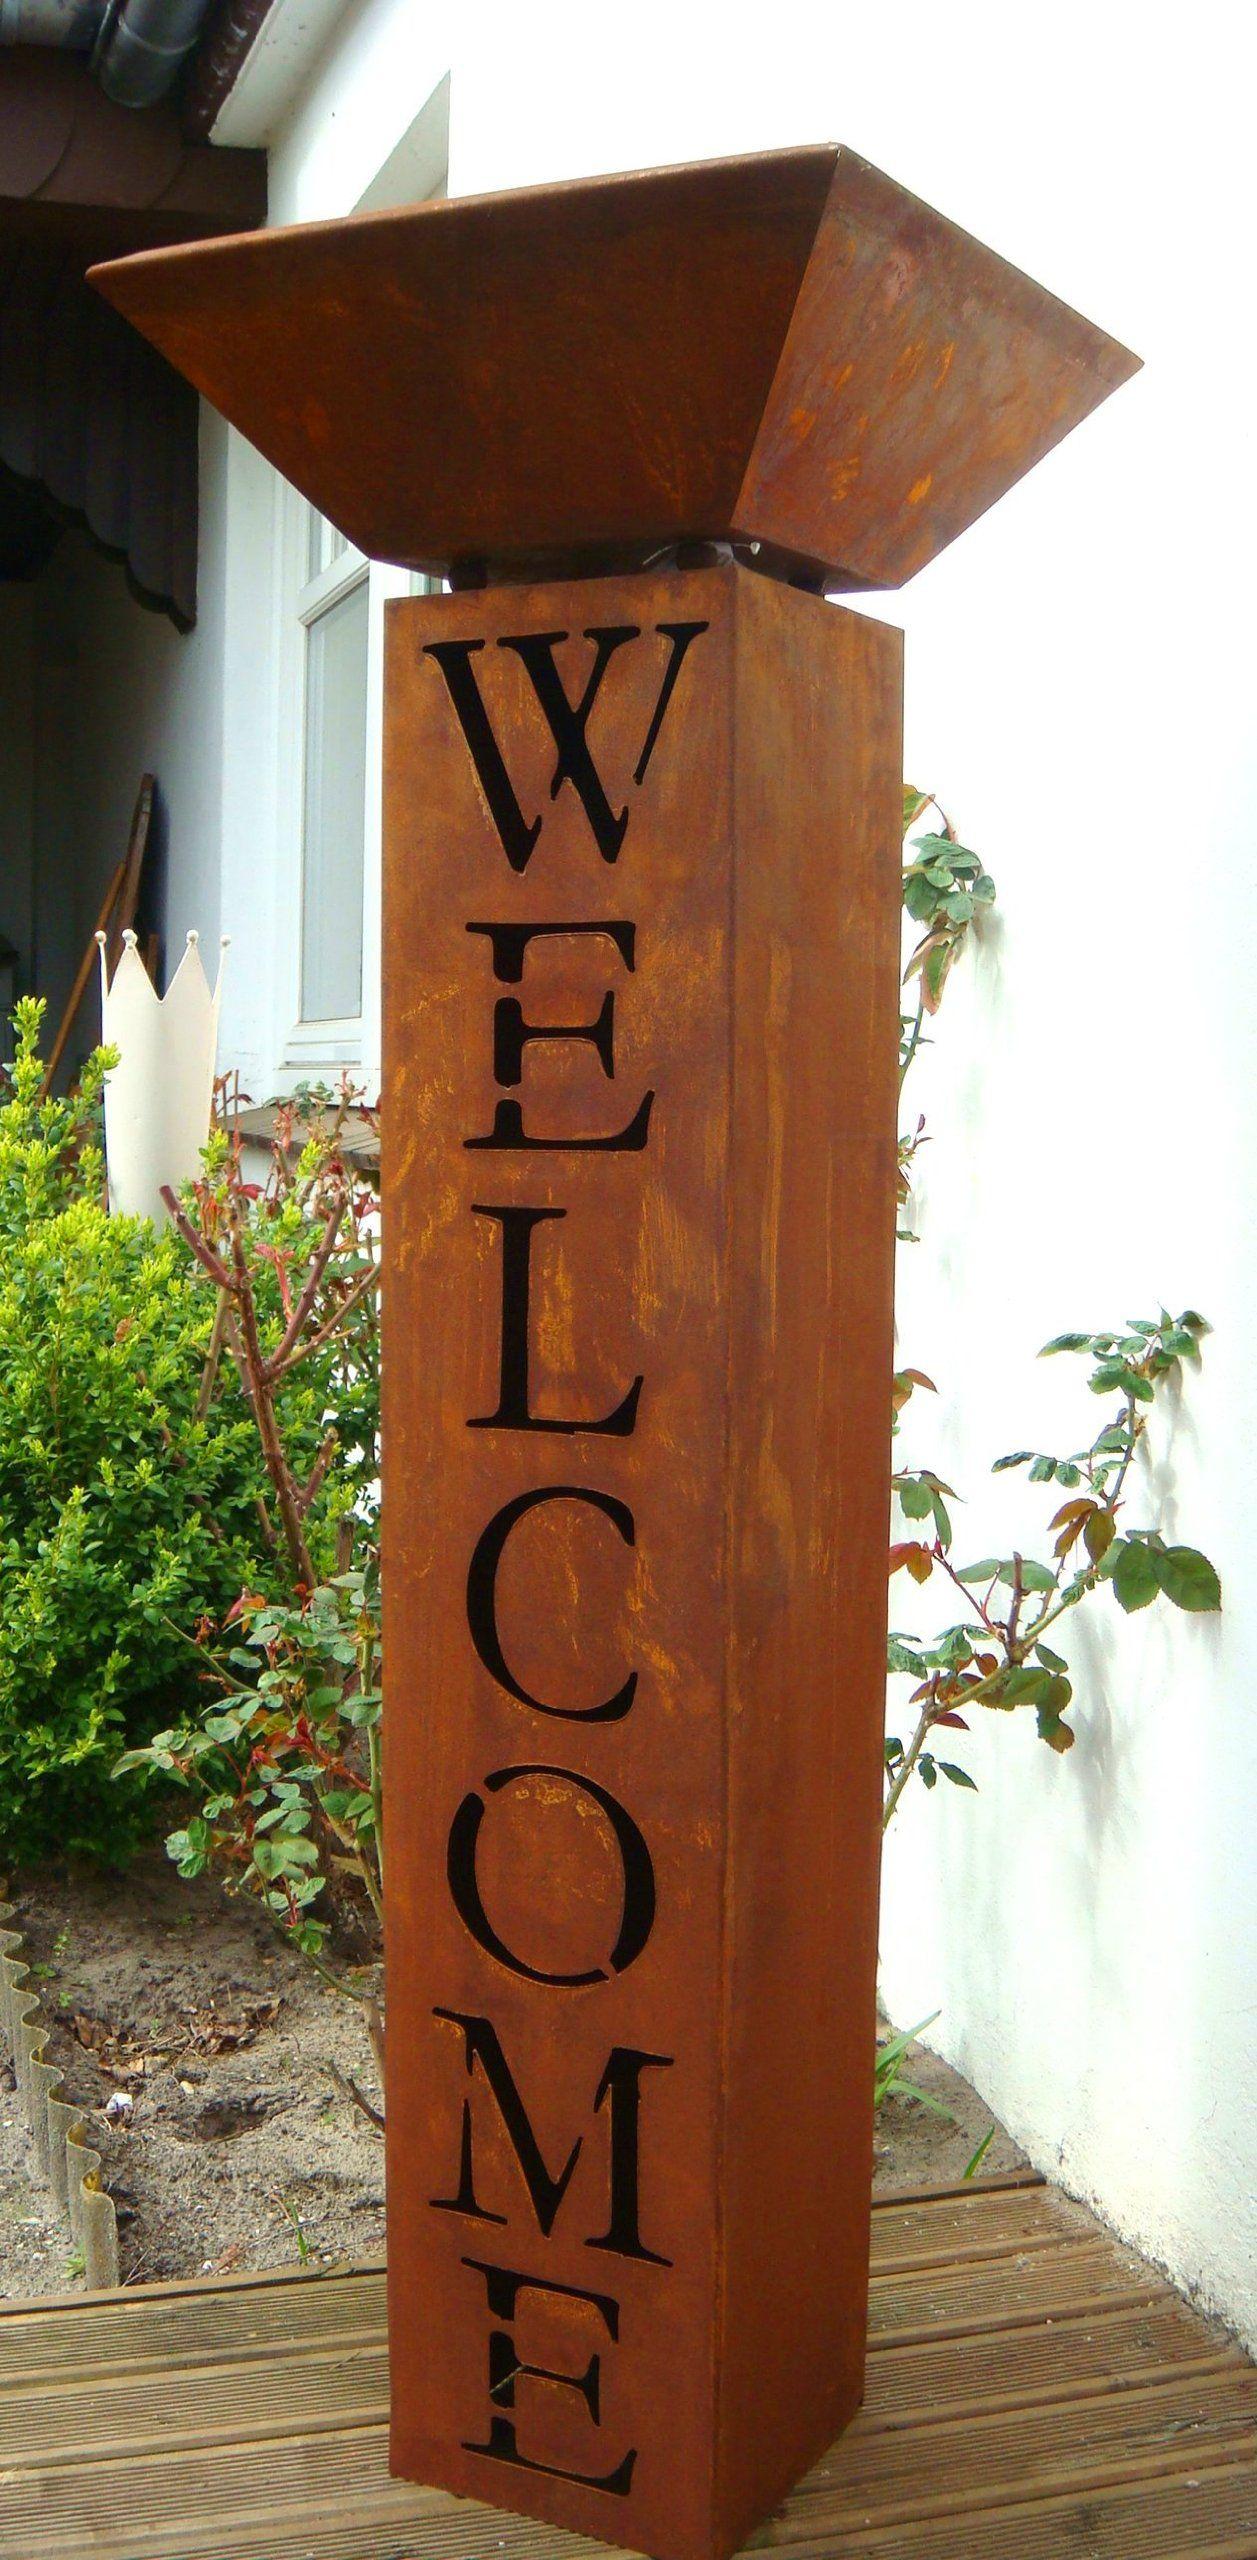 Saule Mit Schale Rost Welcome Willkommen Metall Gartendeko Edelrost 2er Set Eckig Deko Hohe Kpl 115c Rost Deko Garten Metall Gartenkunst Schrottplatzkunst